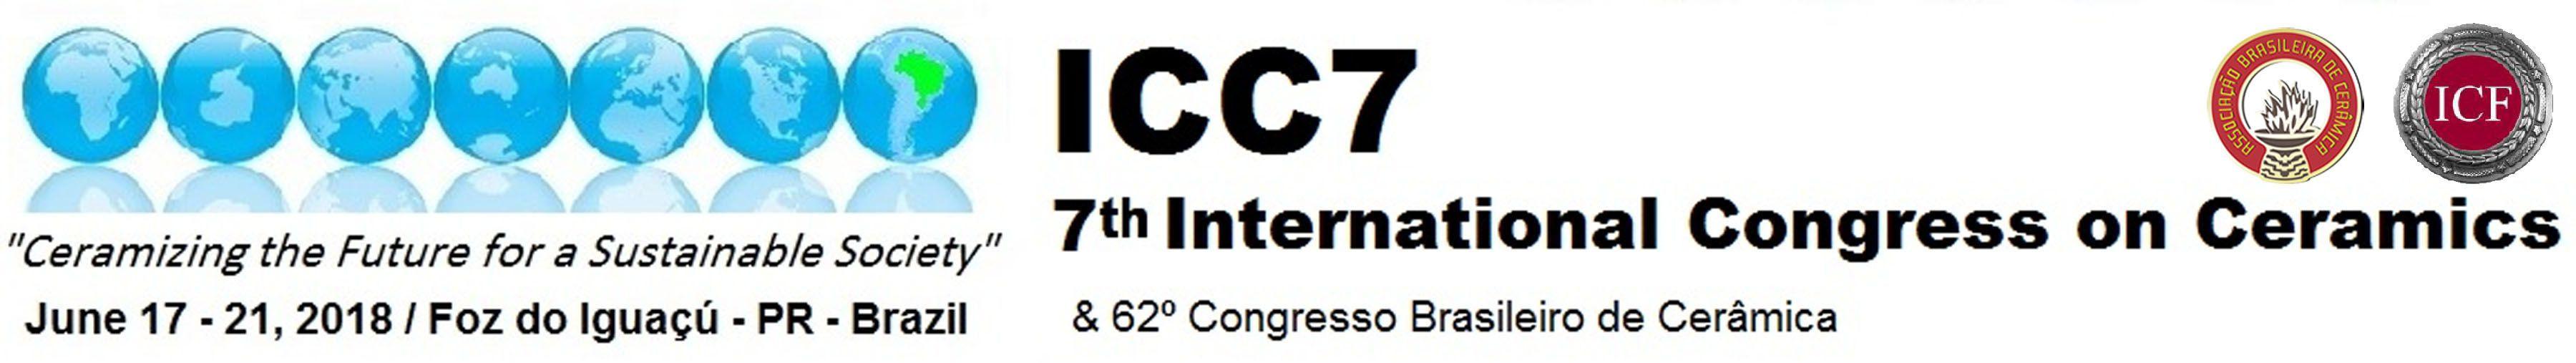 Logo ICC 7